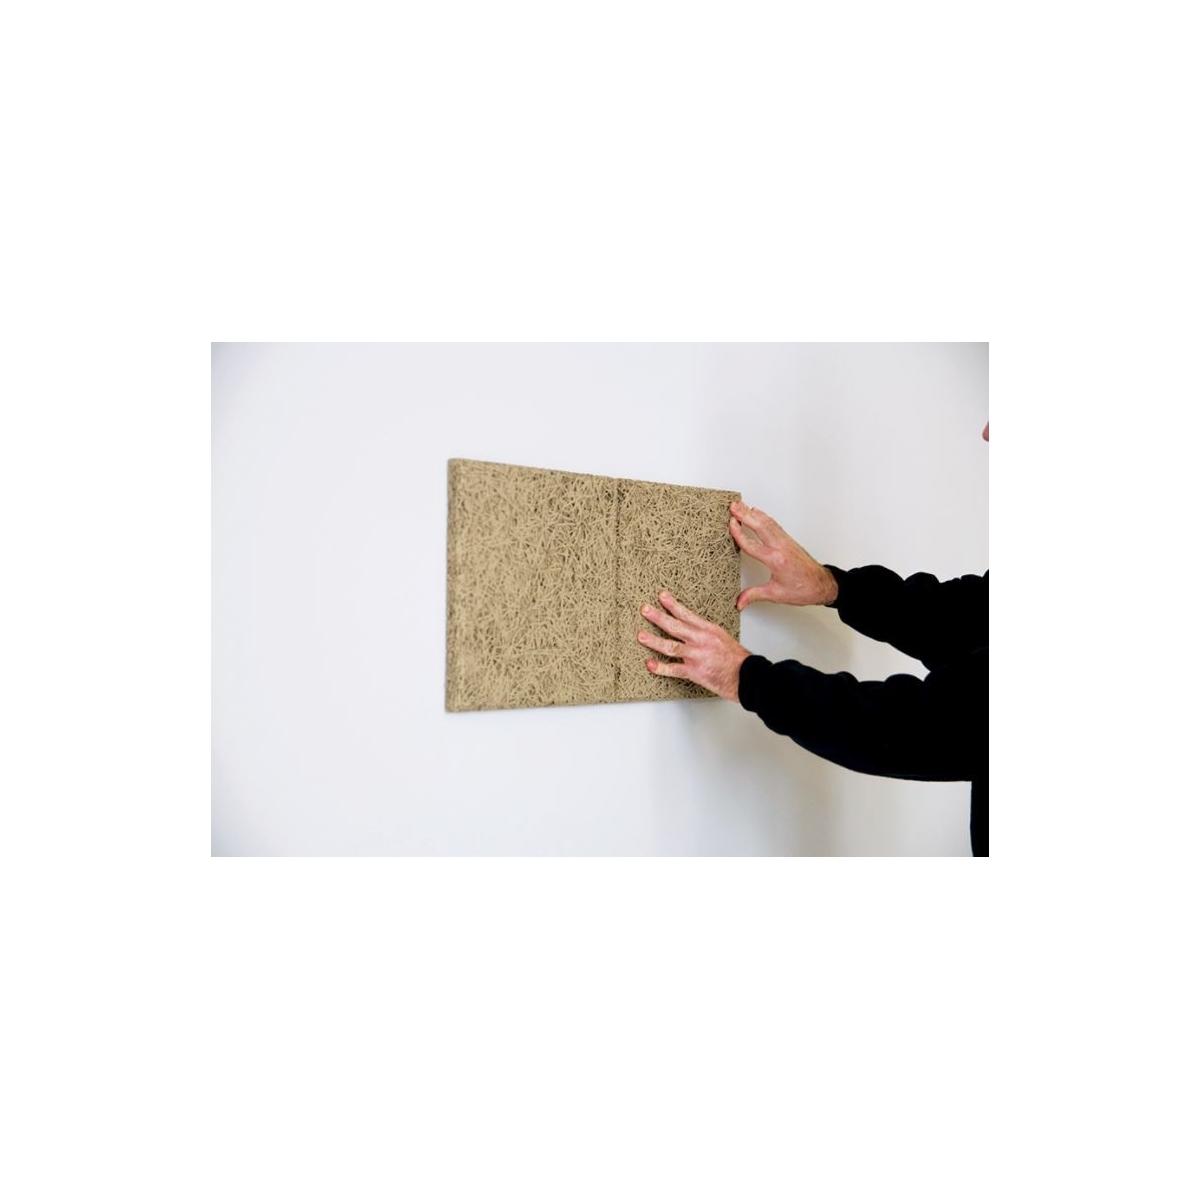 Comprar Panel sintético Legnomuro Gris Medio 29x29 online